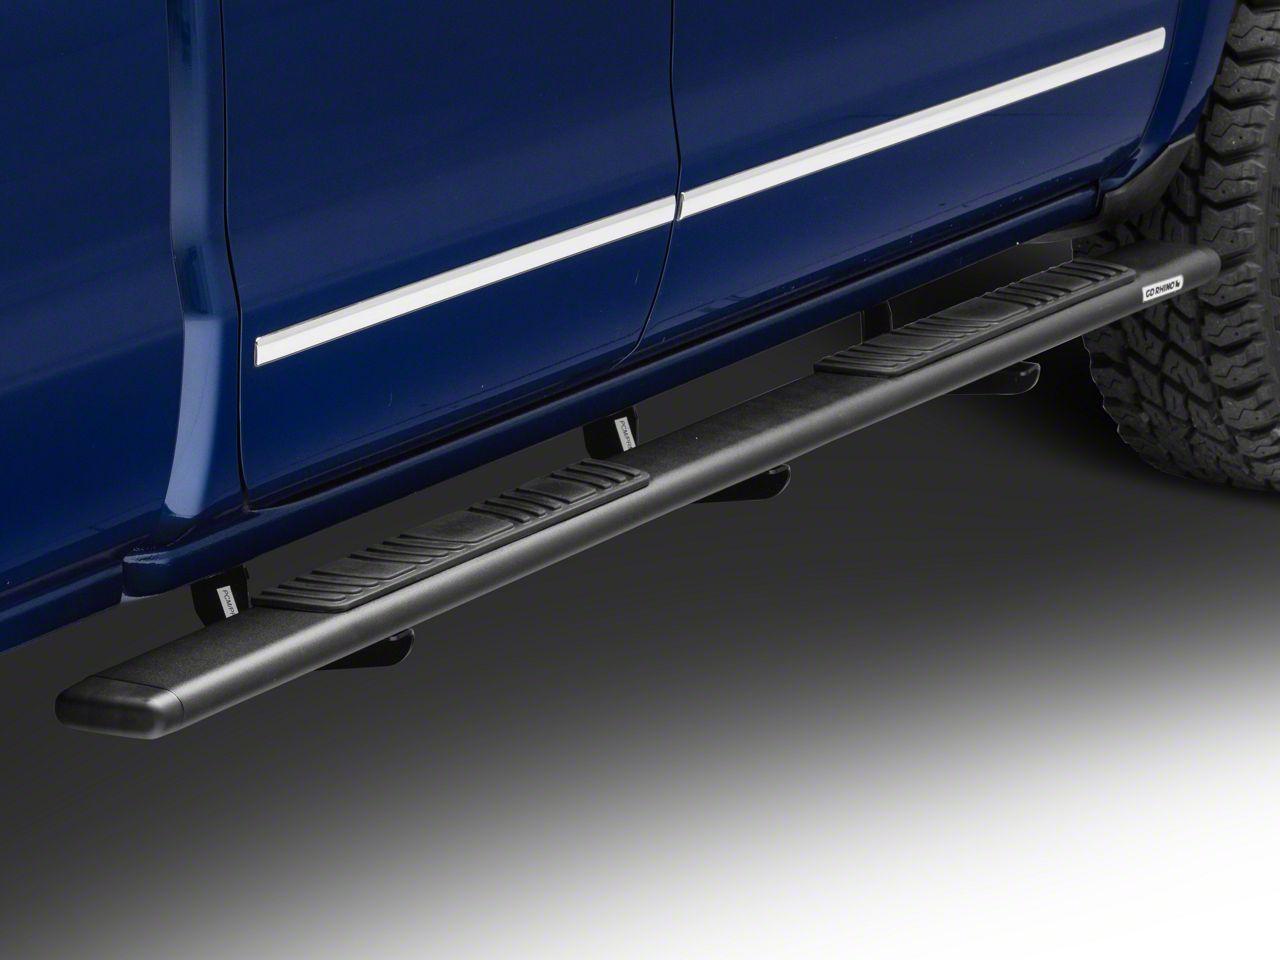 Go Rhino 5 in. OE Xtreme Low Profile Side Step Bars - Textured Black (14-18 Silverado 1500 Crew Cab)